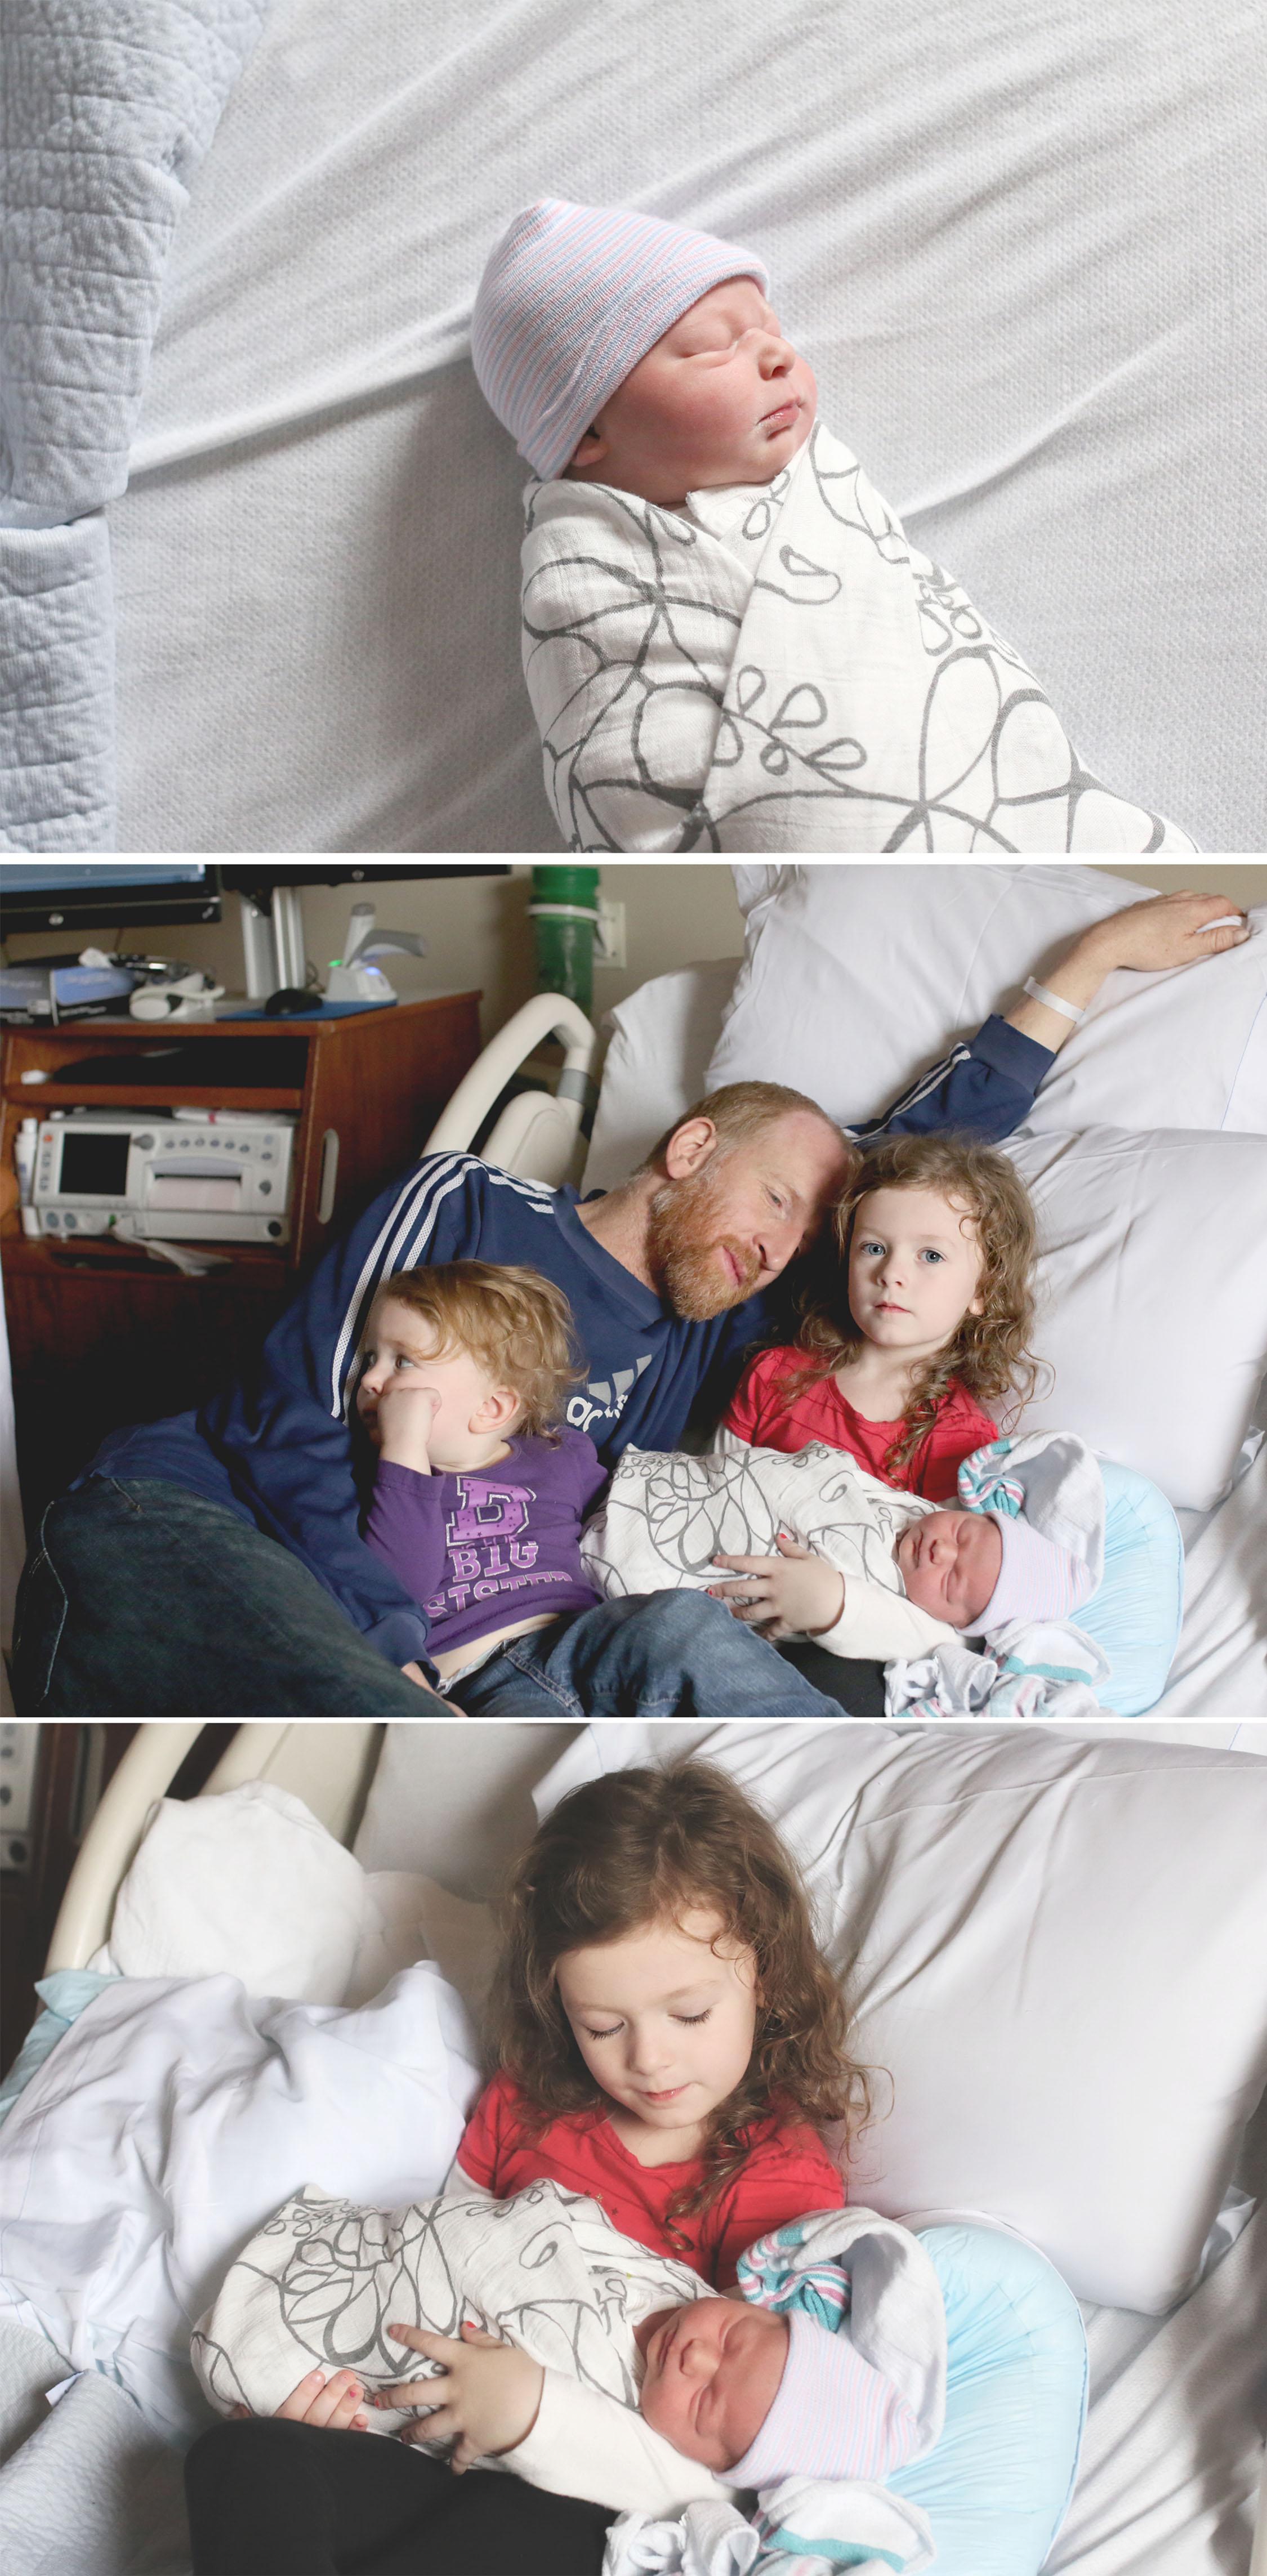 dawson hospital meet siblings5